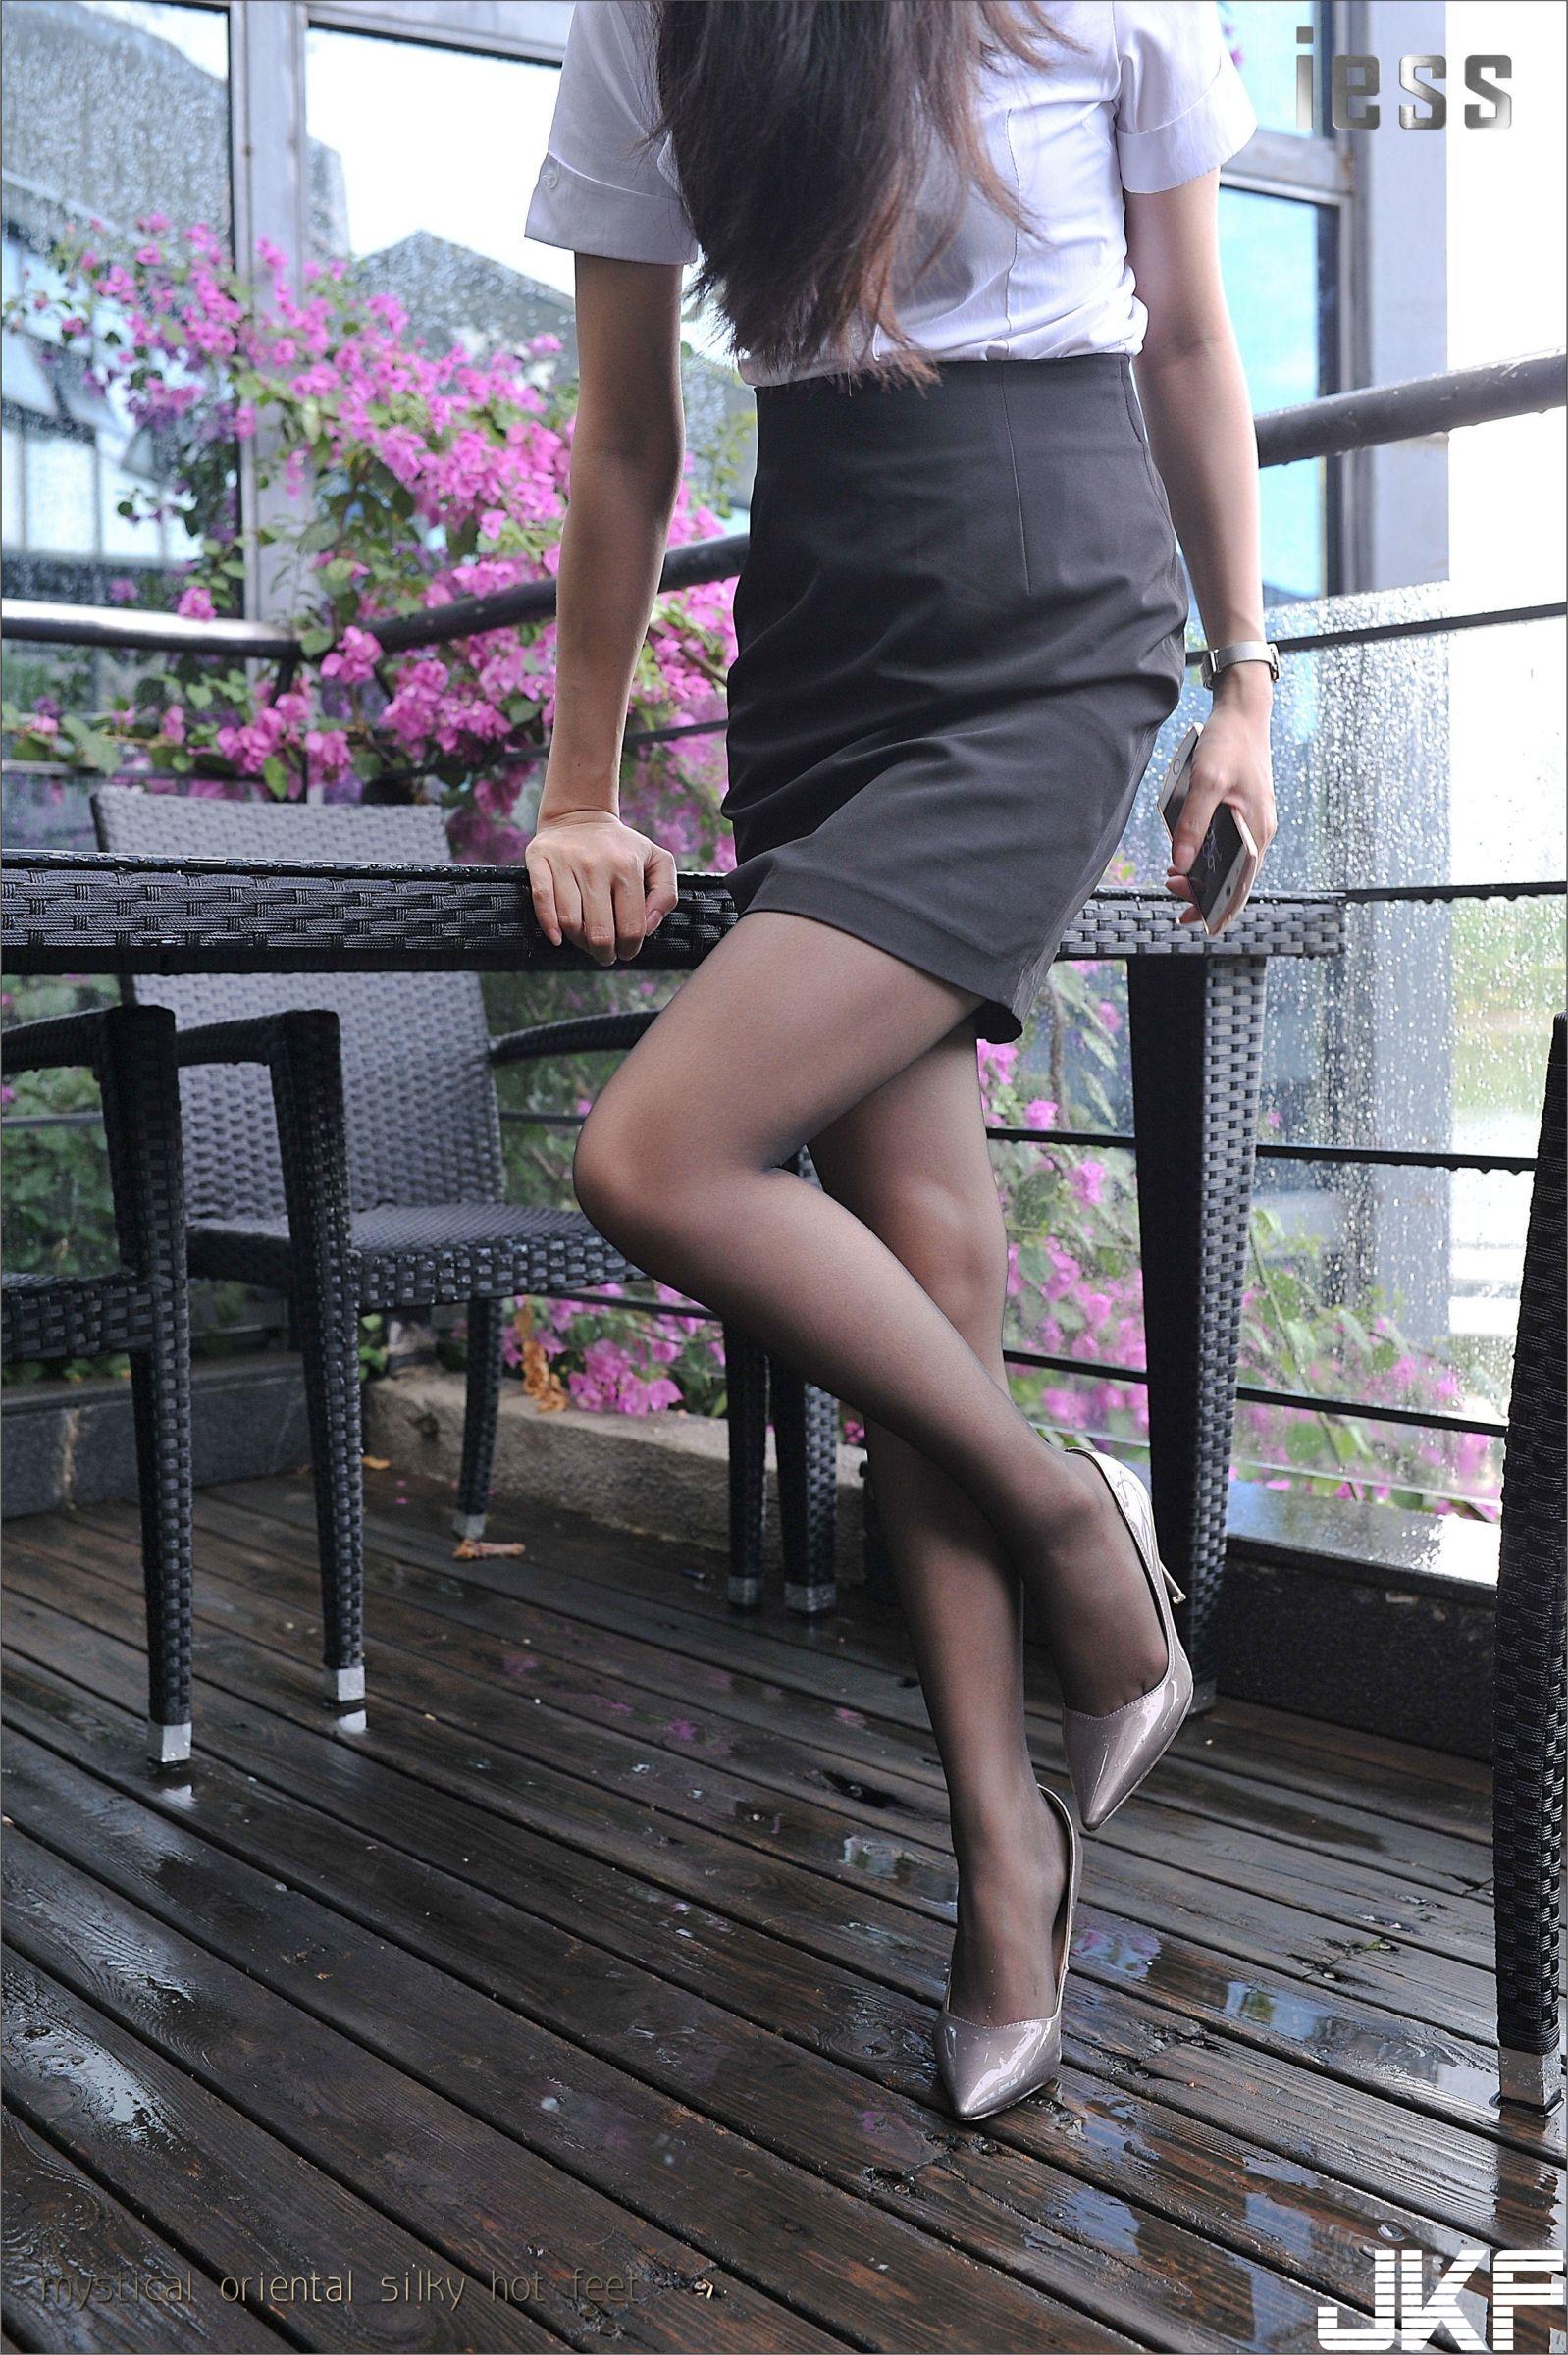 【IESS异思趣向系列】小雪 OL制服黑丝【99P】 - 貼圖 - 絲襪美腿 -